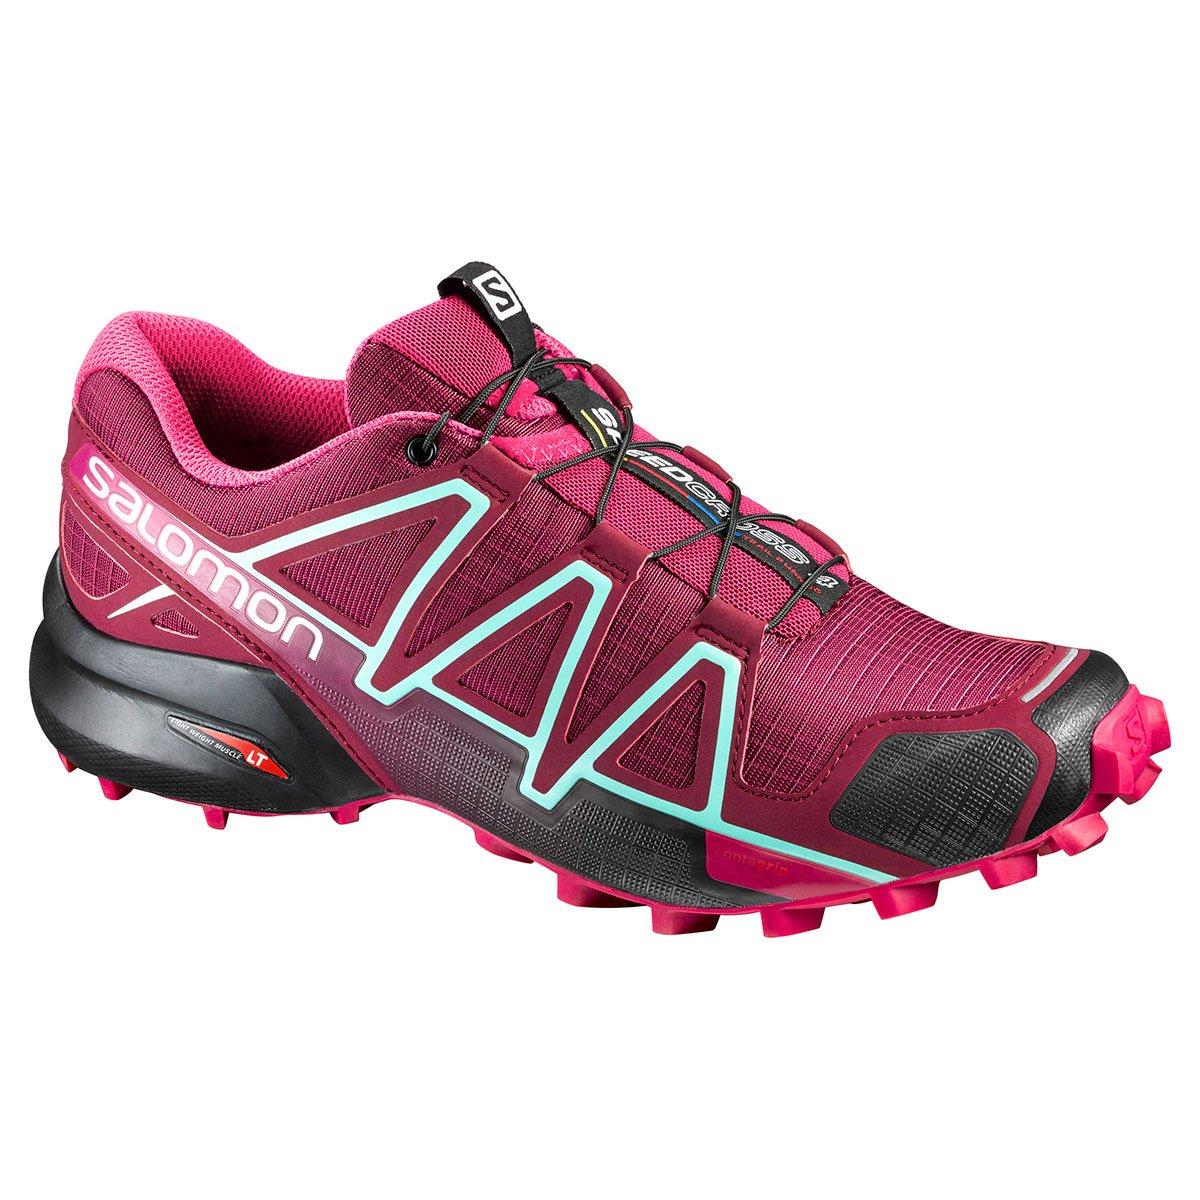 Salomon Damen Damen Damen Speedcross 4 Traillaufschuhe  be681d